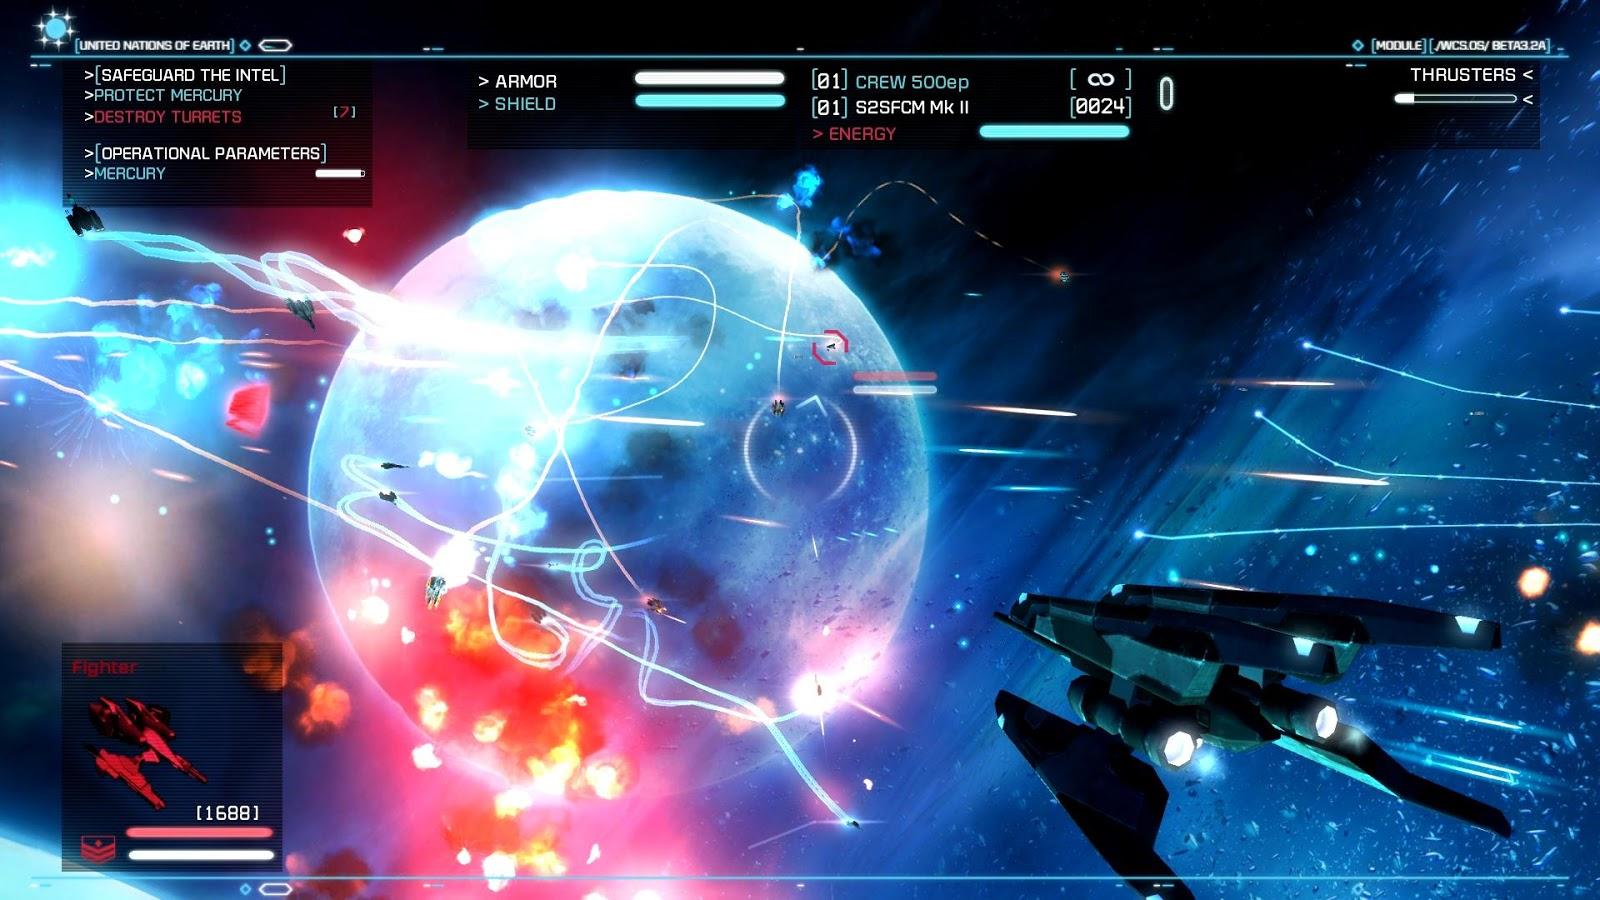 Strike Suit Zero - PC UPDATE 1 [FREE DOWNLOAD]